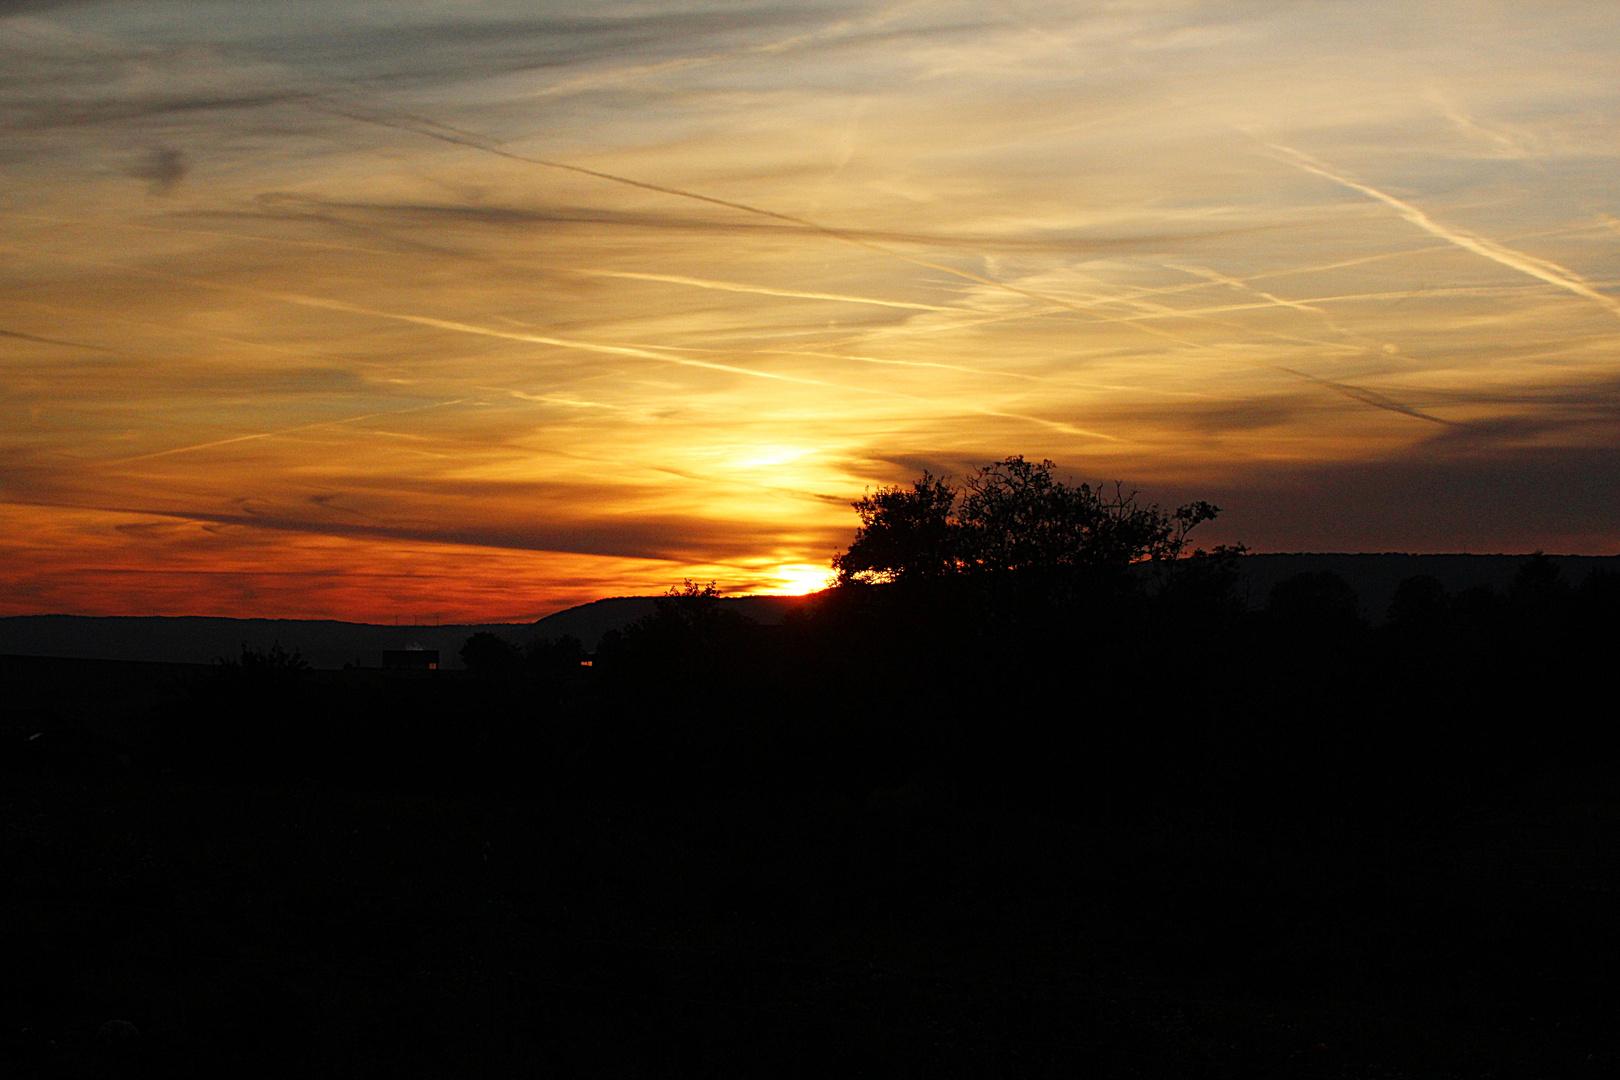 Sonnenuntergang in Lobach